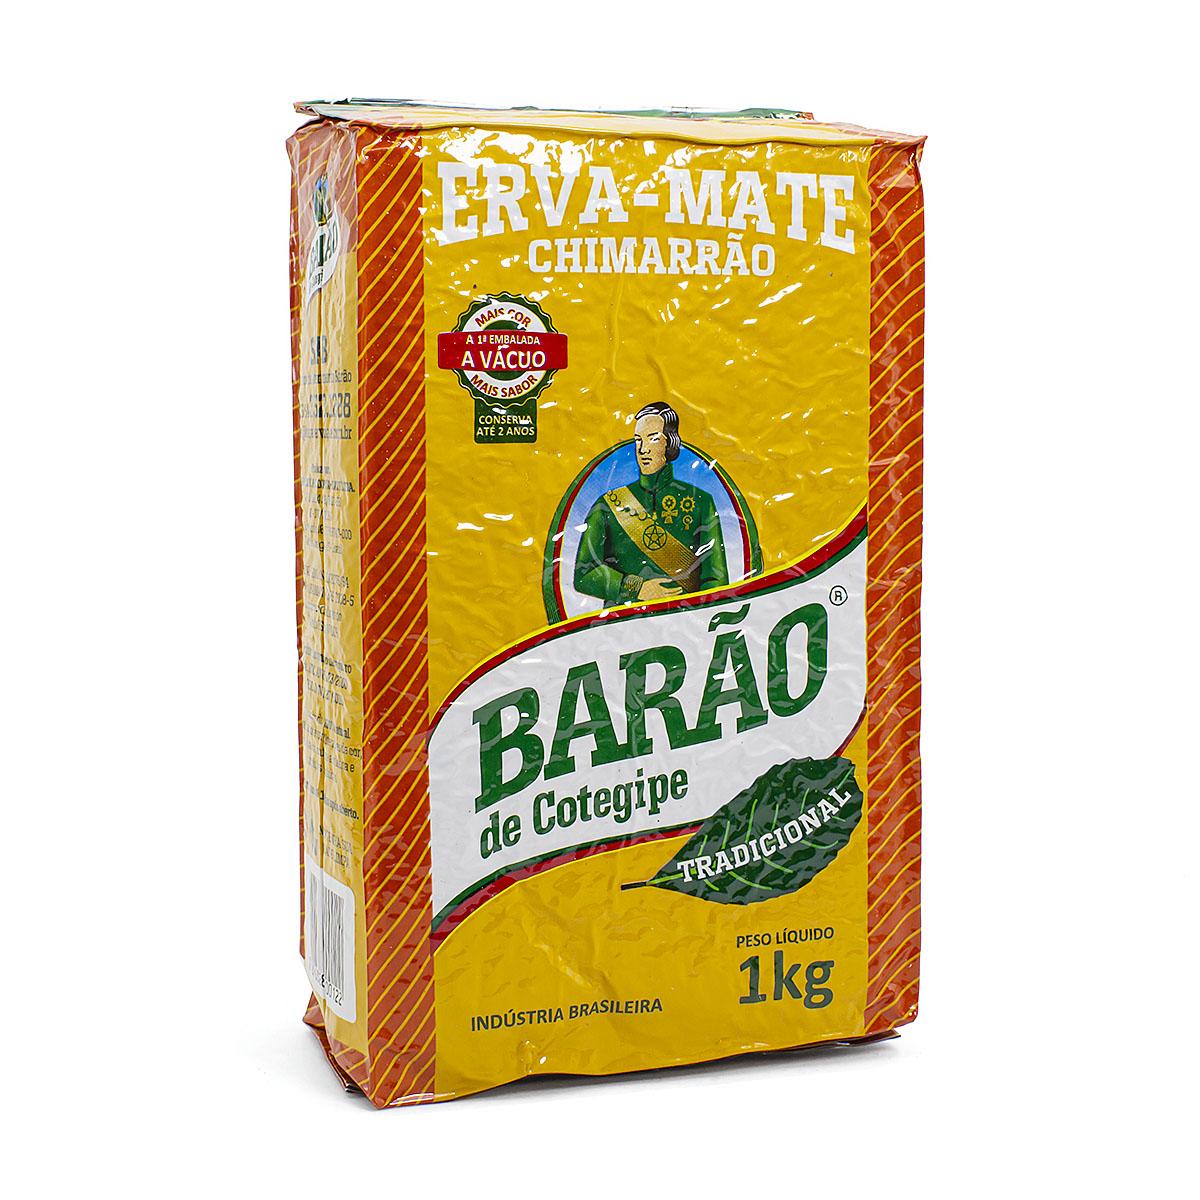 Мате Barao De Cotegipe Tradicional, 1000 г мате pipore especial 1000 г